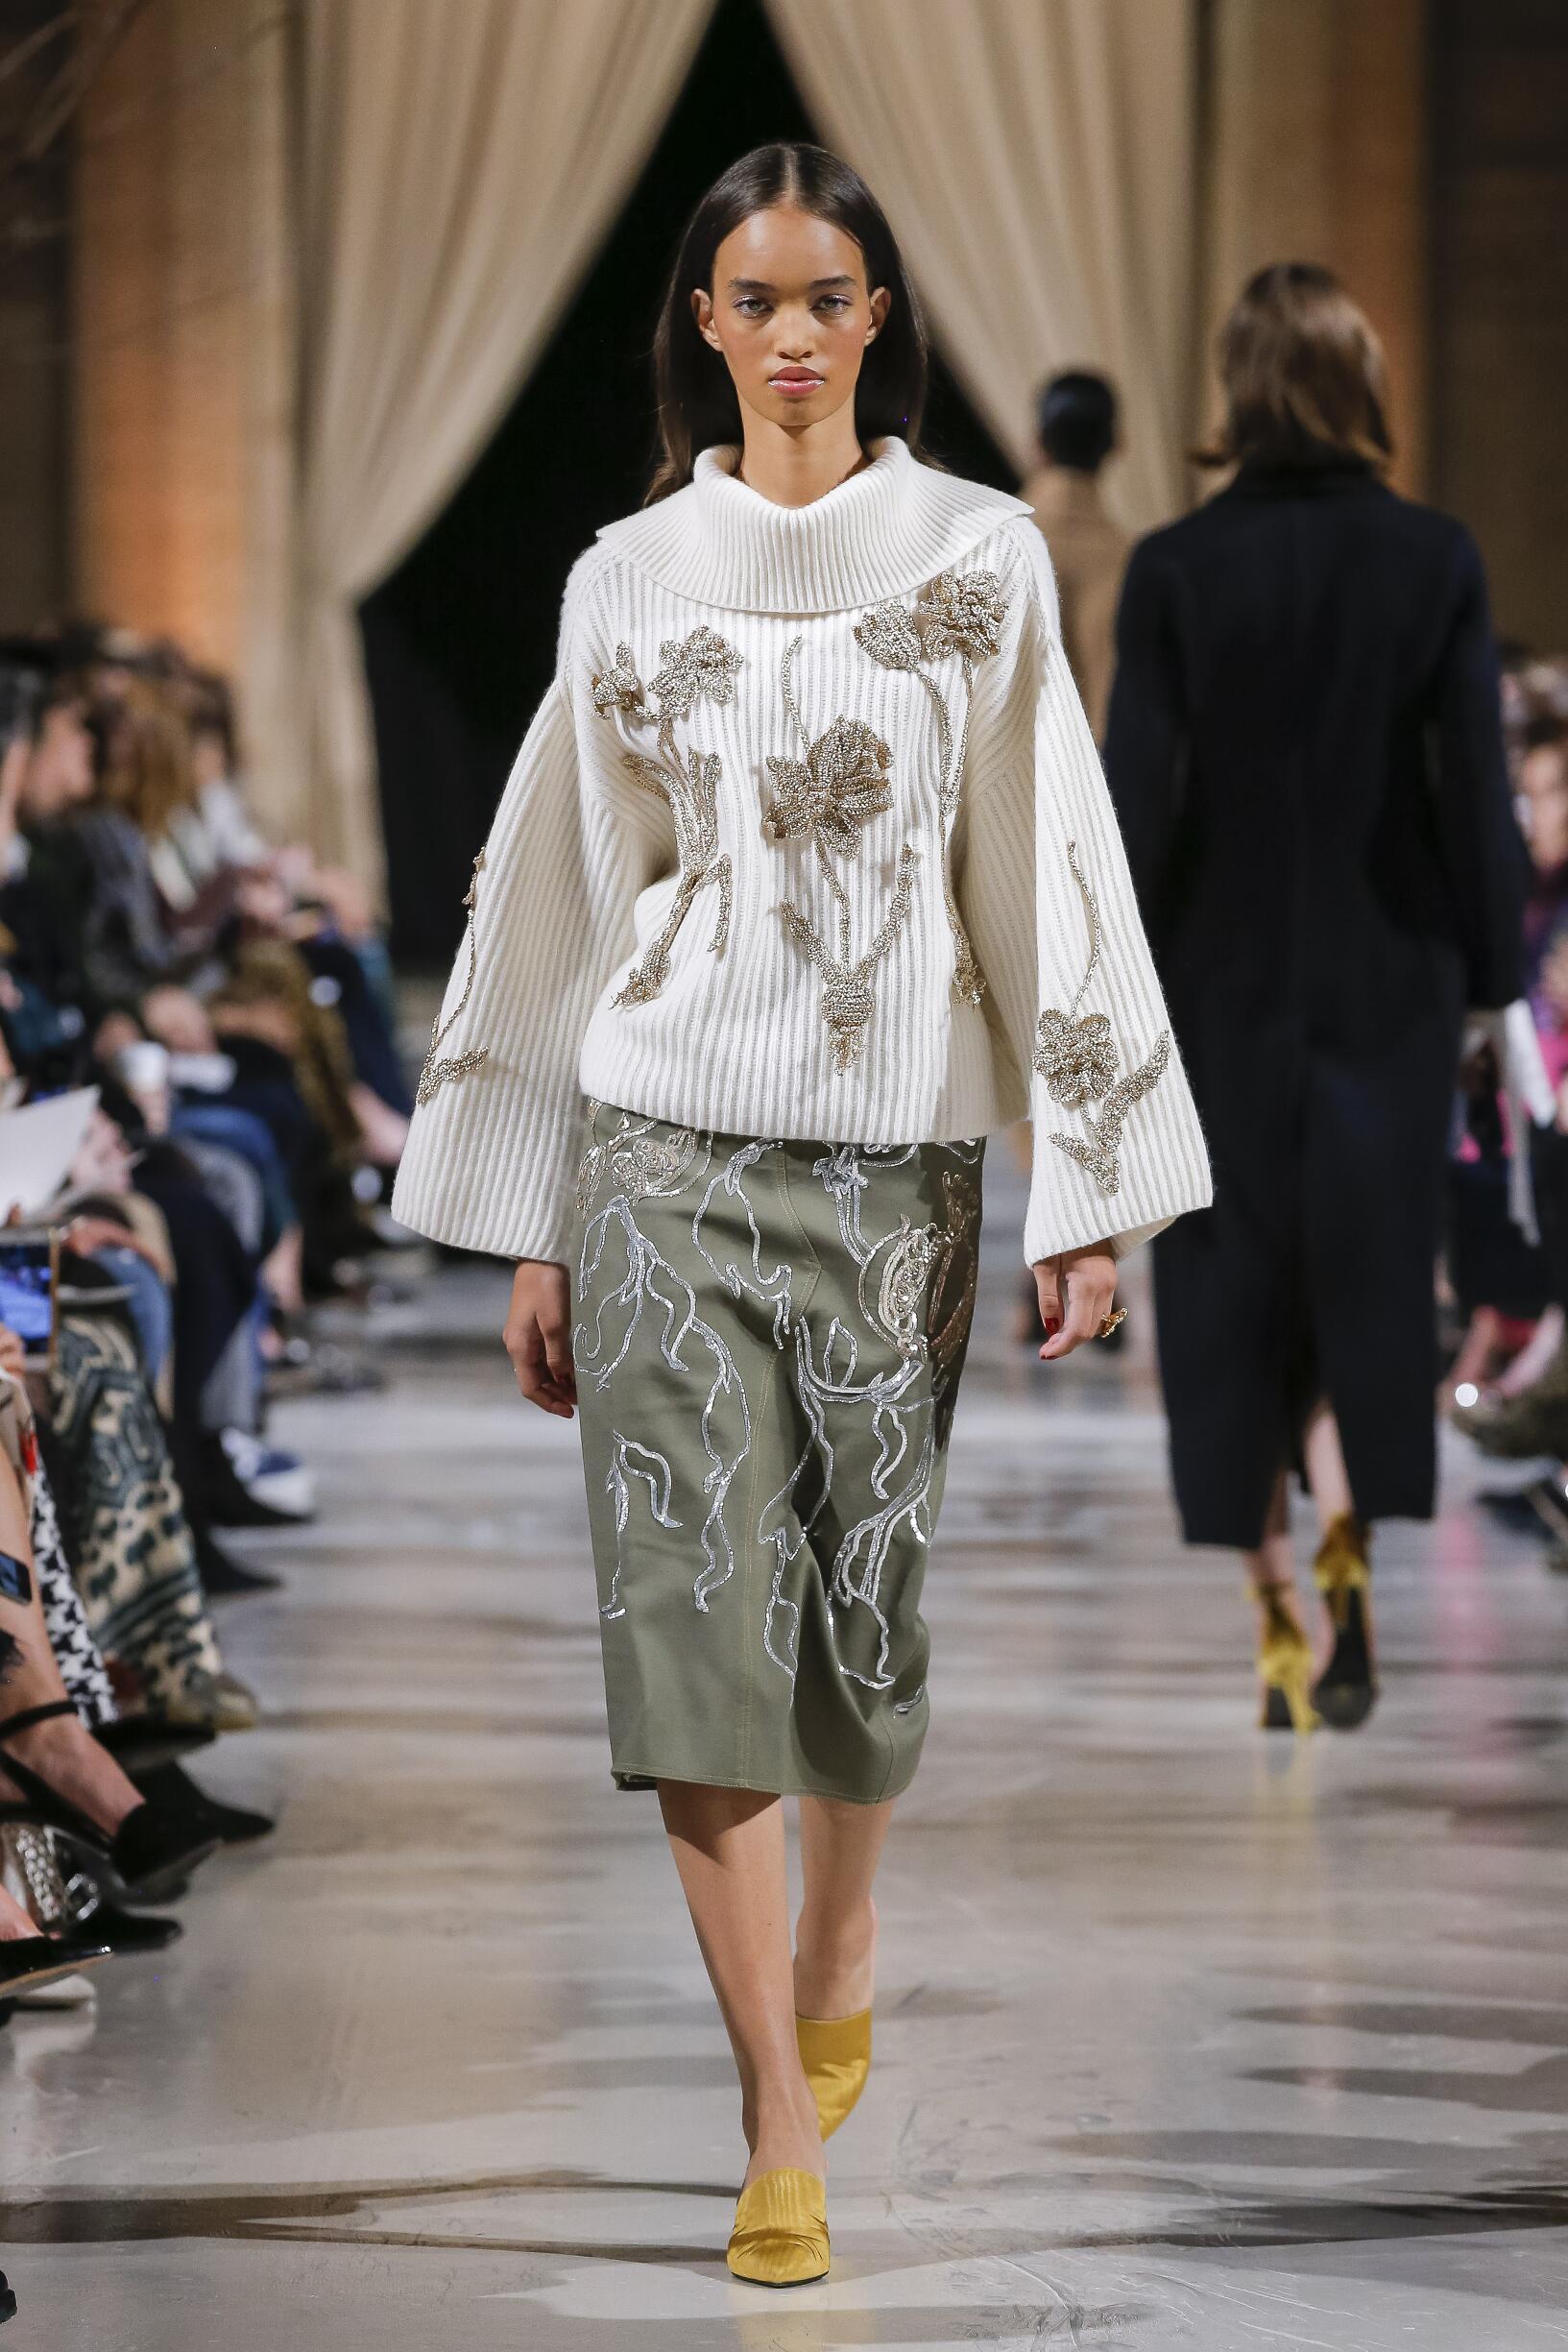 Oscar de la Renta Fall Winter 2018 Womens Collection New York Fashion Week